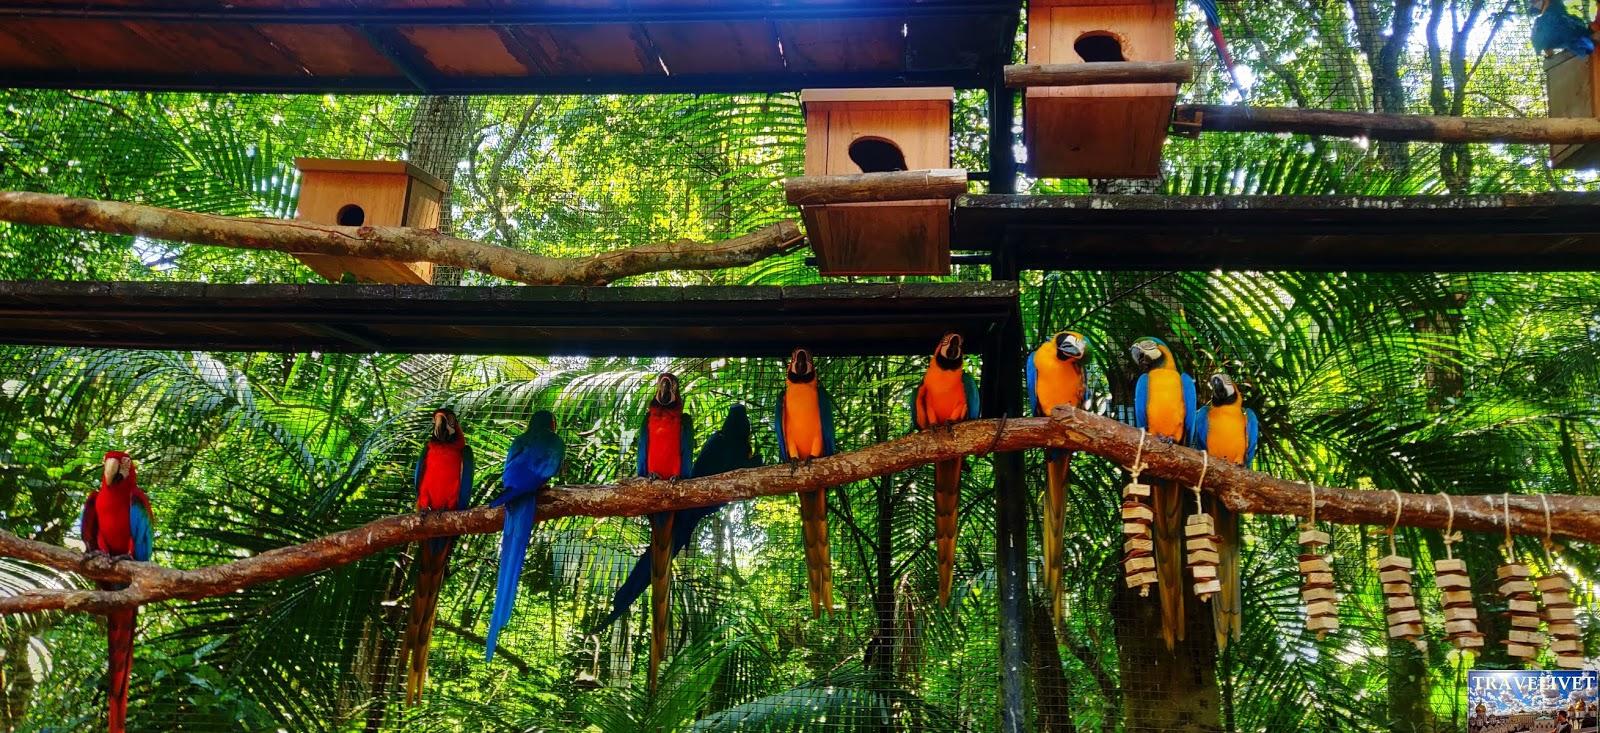 Iguassu Iguaçu Iguazu Brésil Chutes Cascade parc oiseau aves